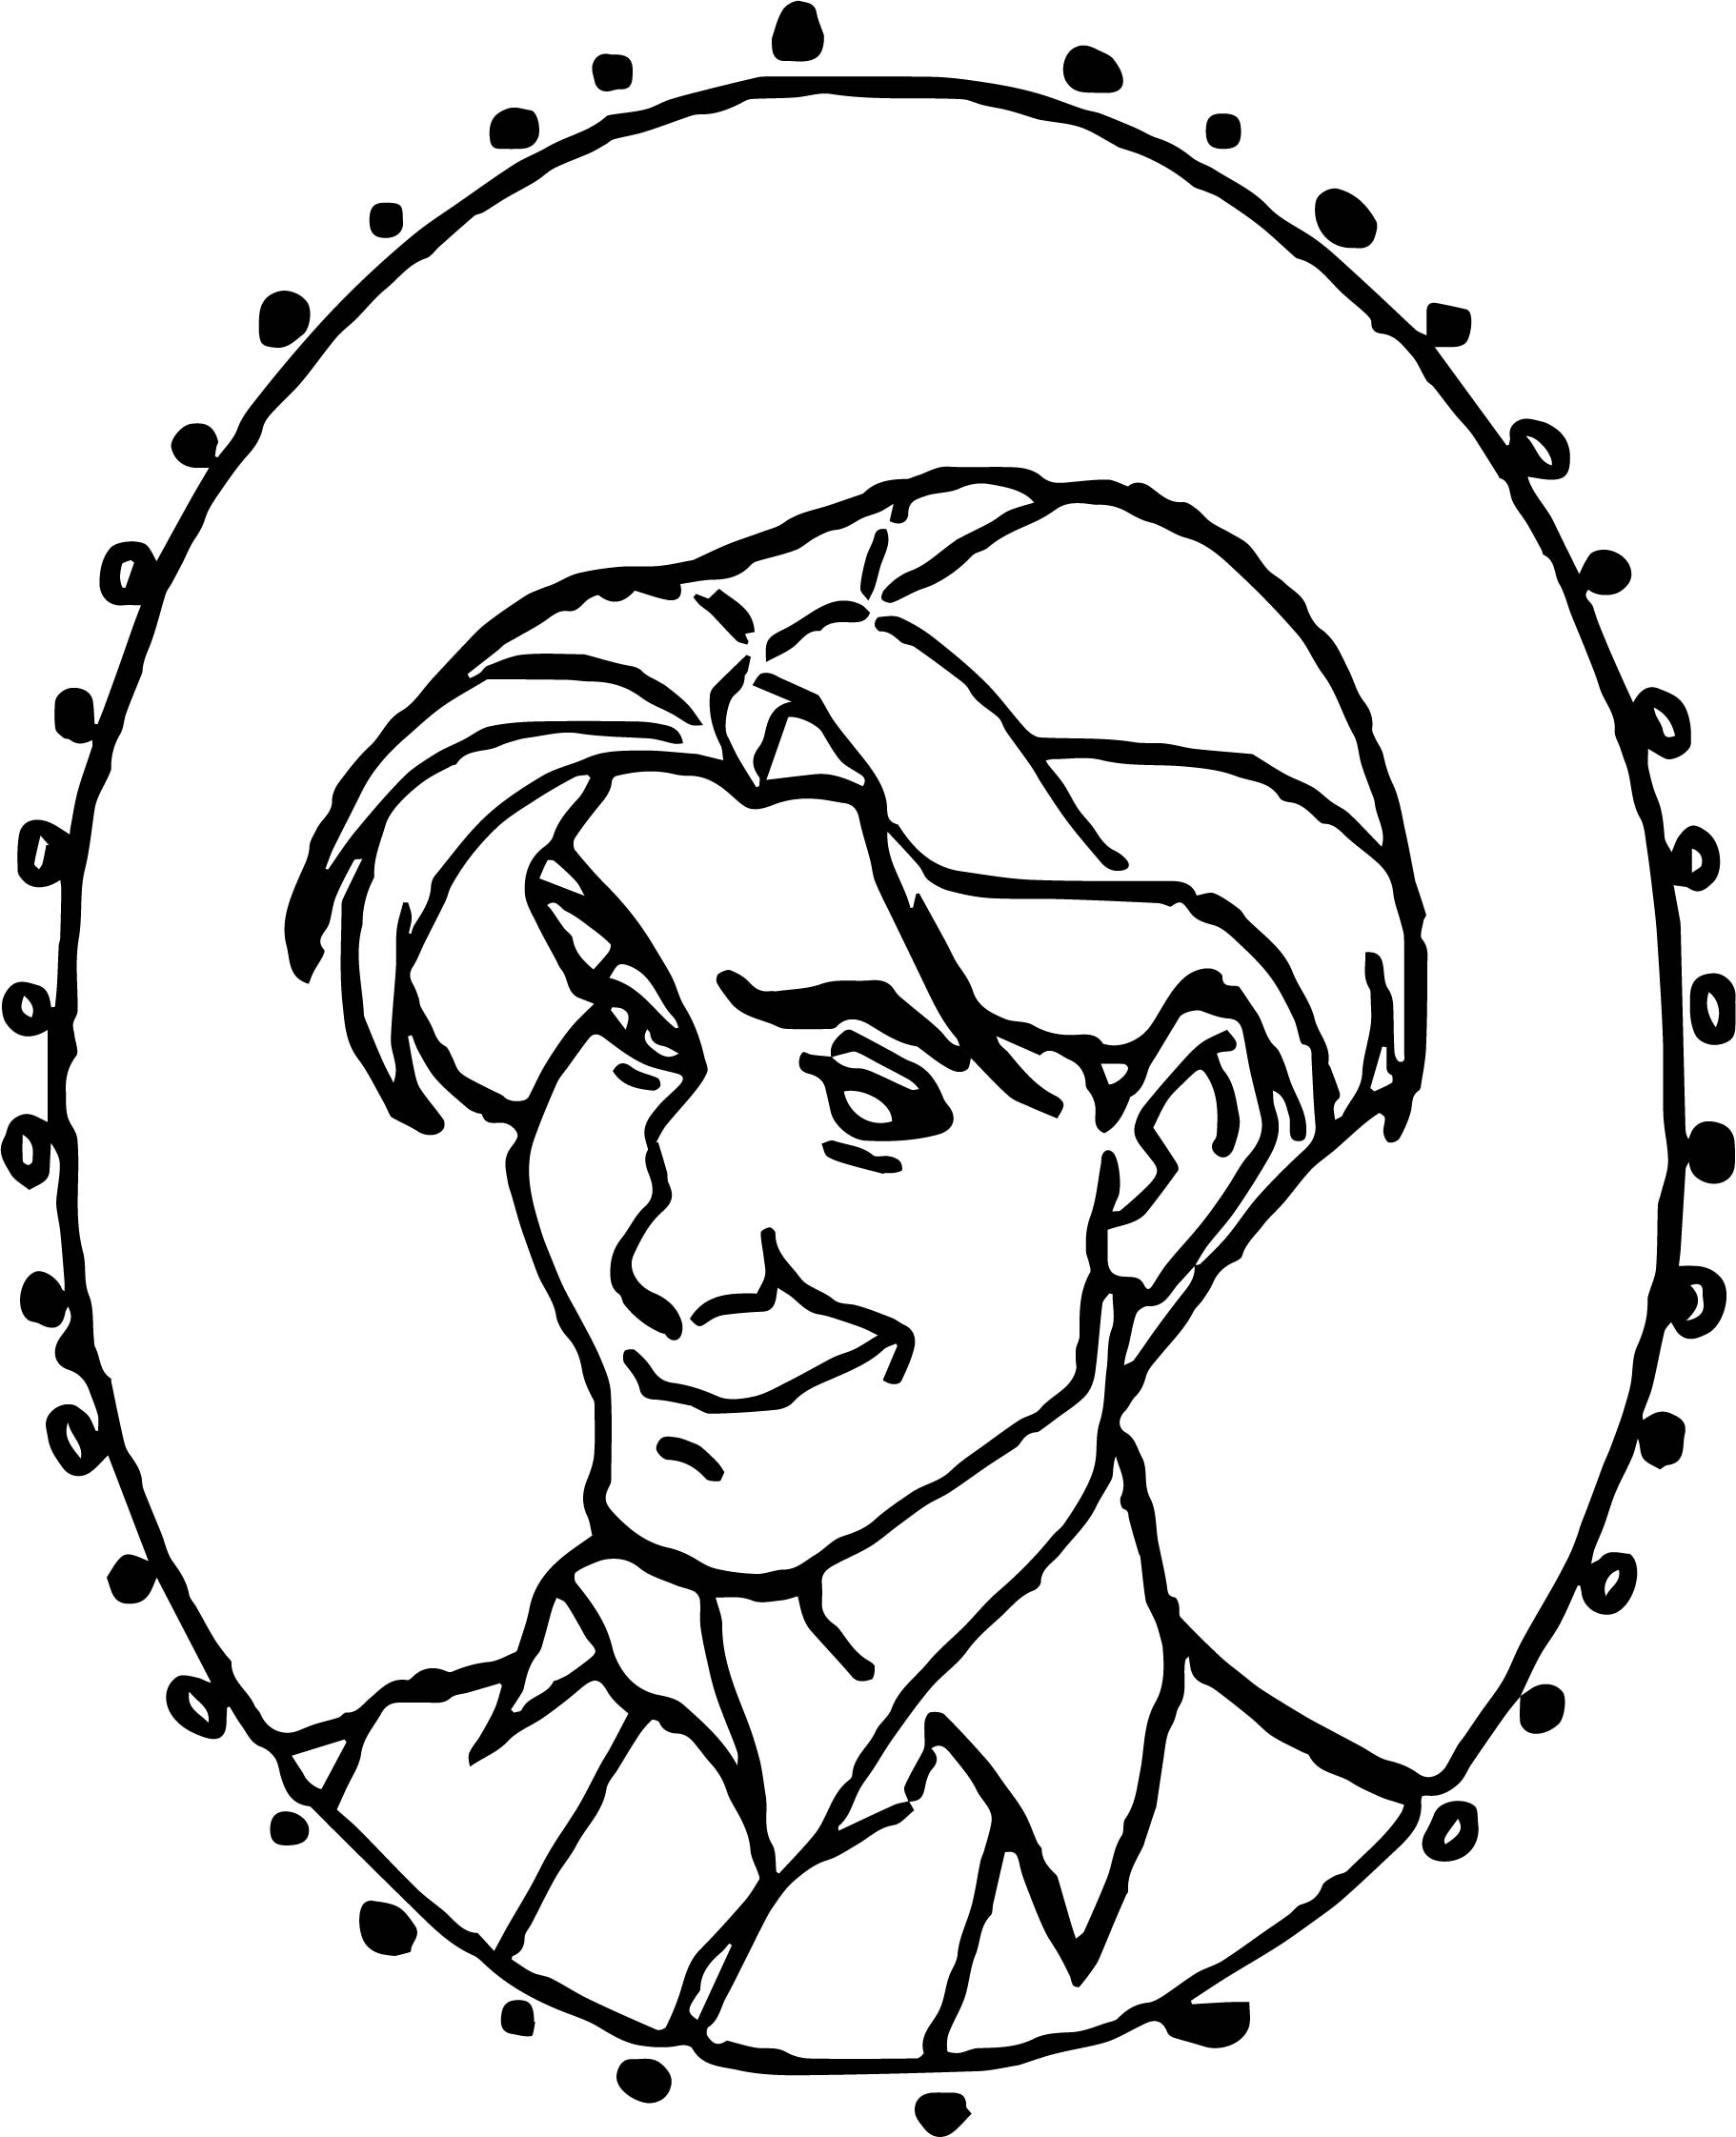 Dimitri Image Circle Coloring Page